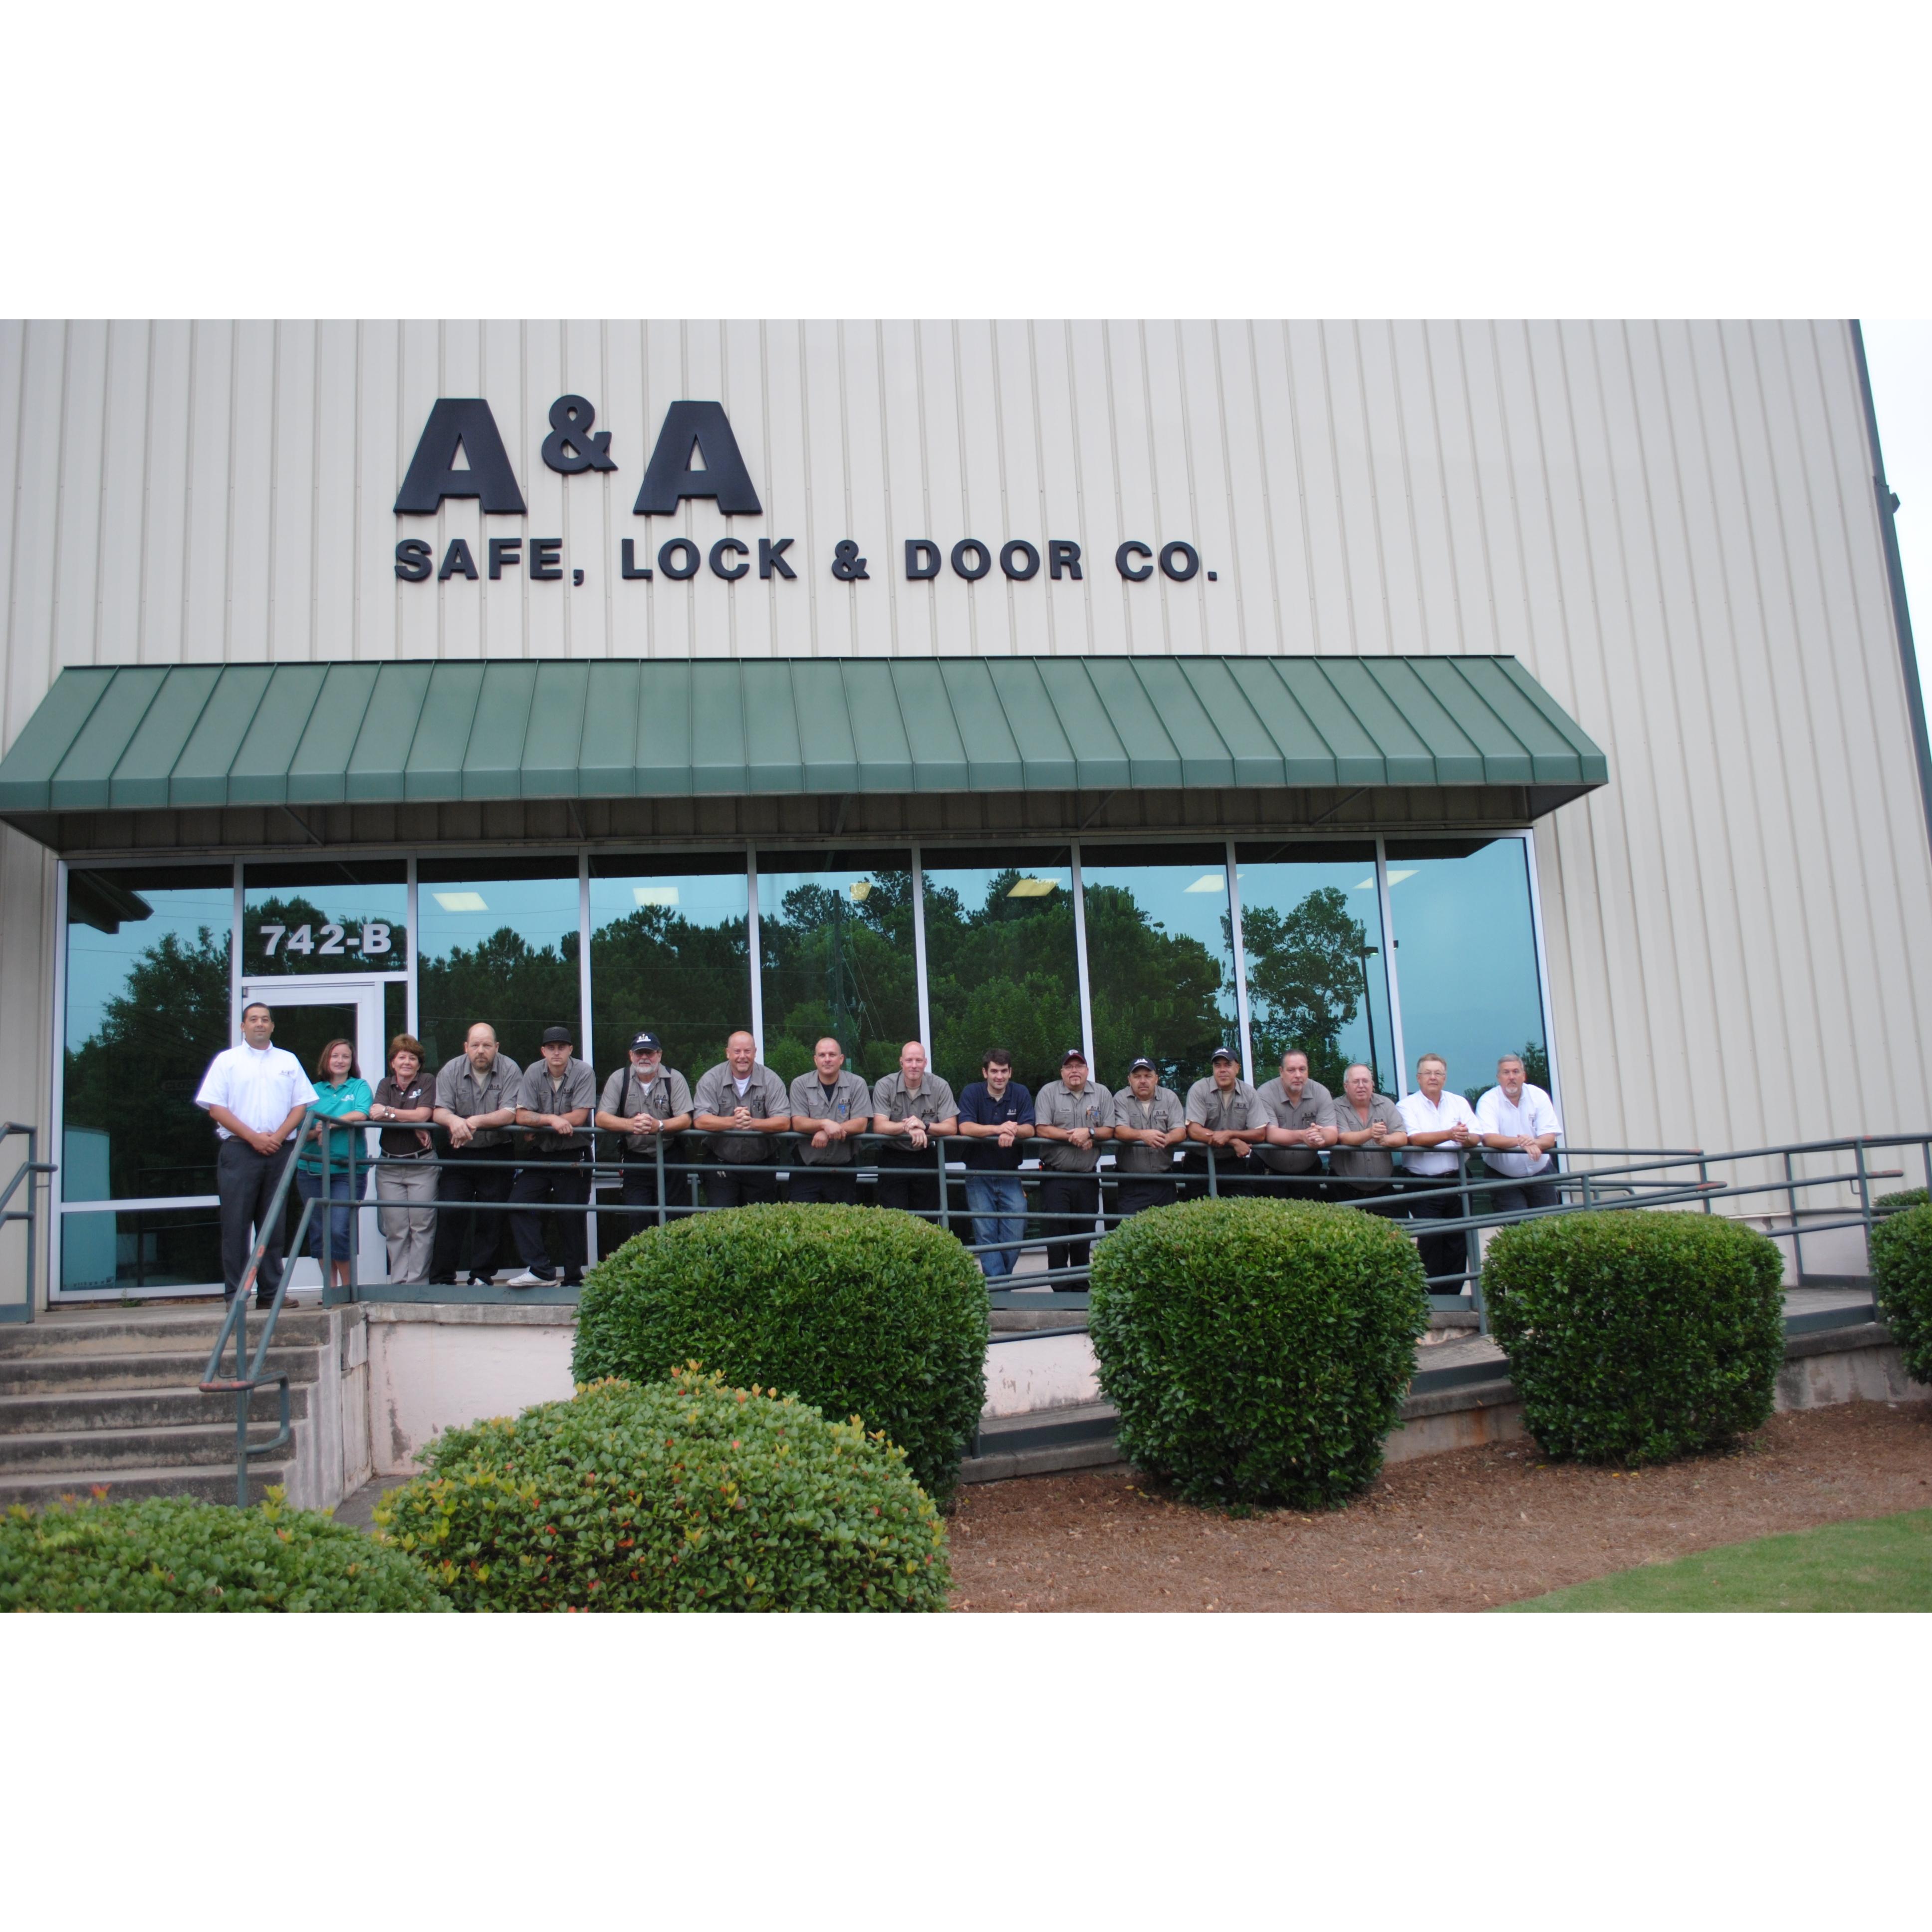 A&A Safe, Lock & Door - Lawrenceville